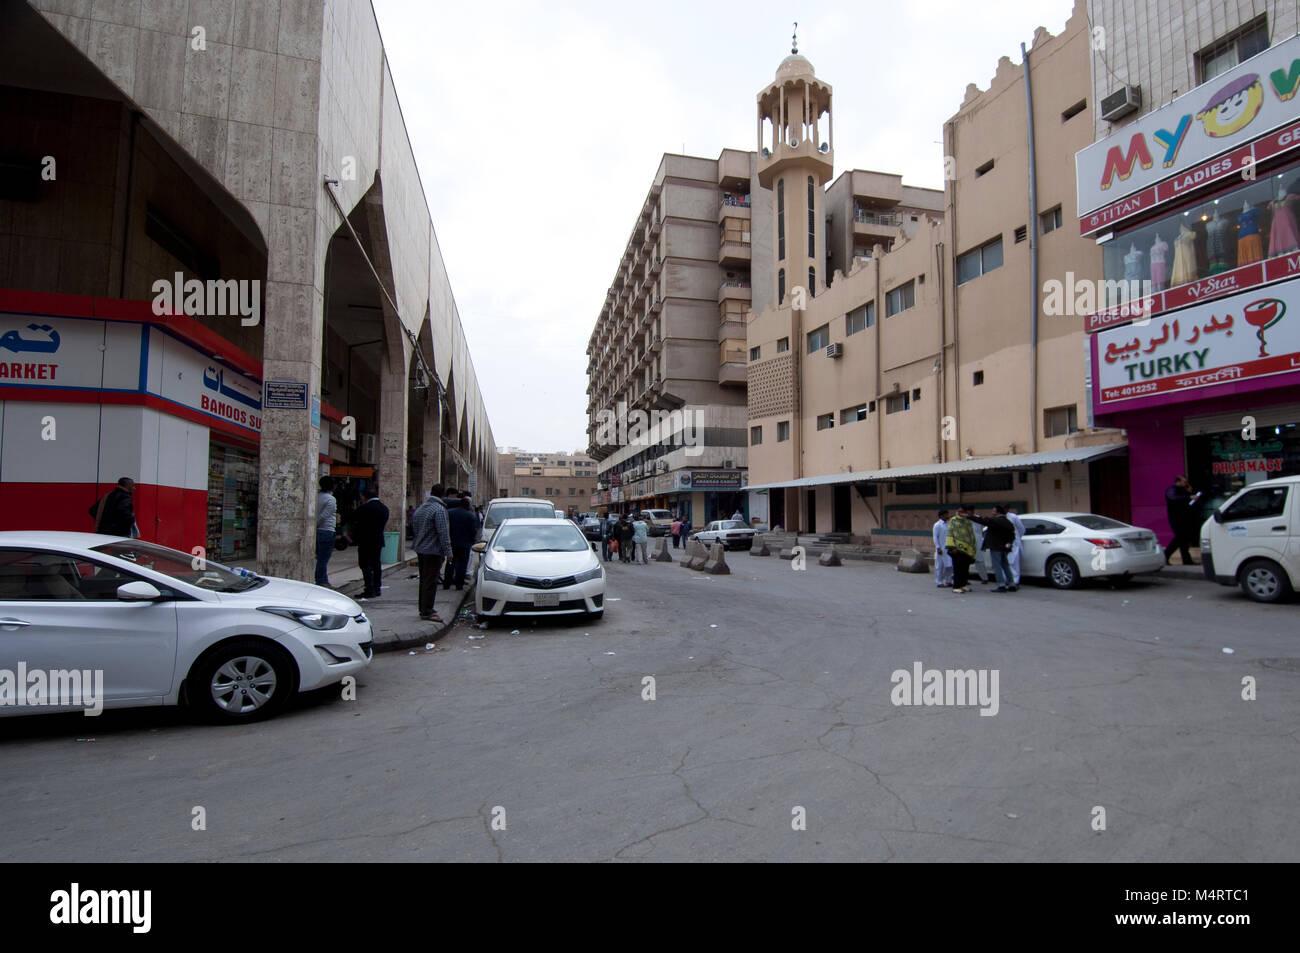 Shops and Shoppers in Old 'Batha',Riyadh City Saudi Arabia, 01.12.2016 - Stock Image